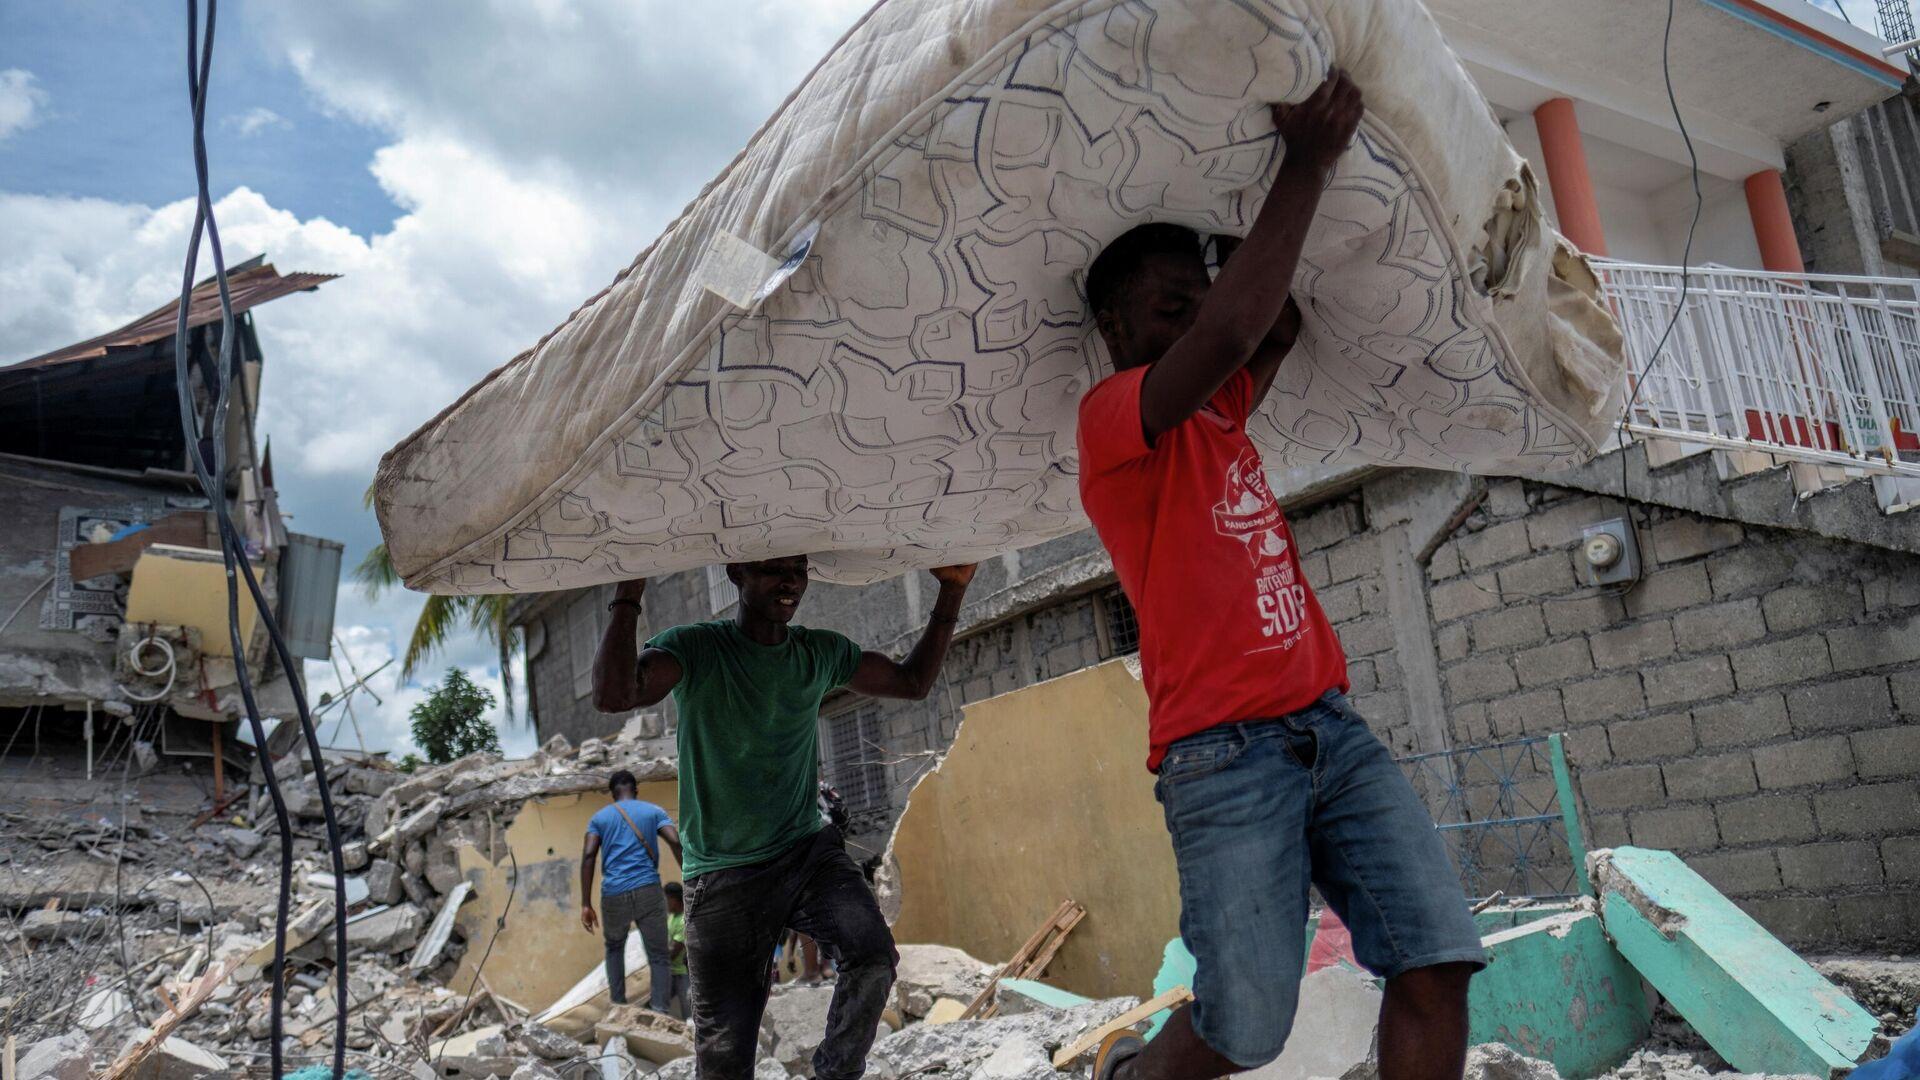 Un terremoto en Haití - Sputnik Mundo, 1920, 30.08.2021